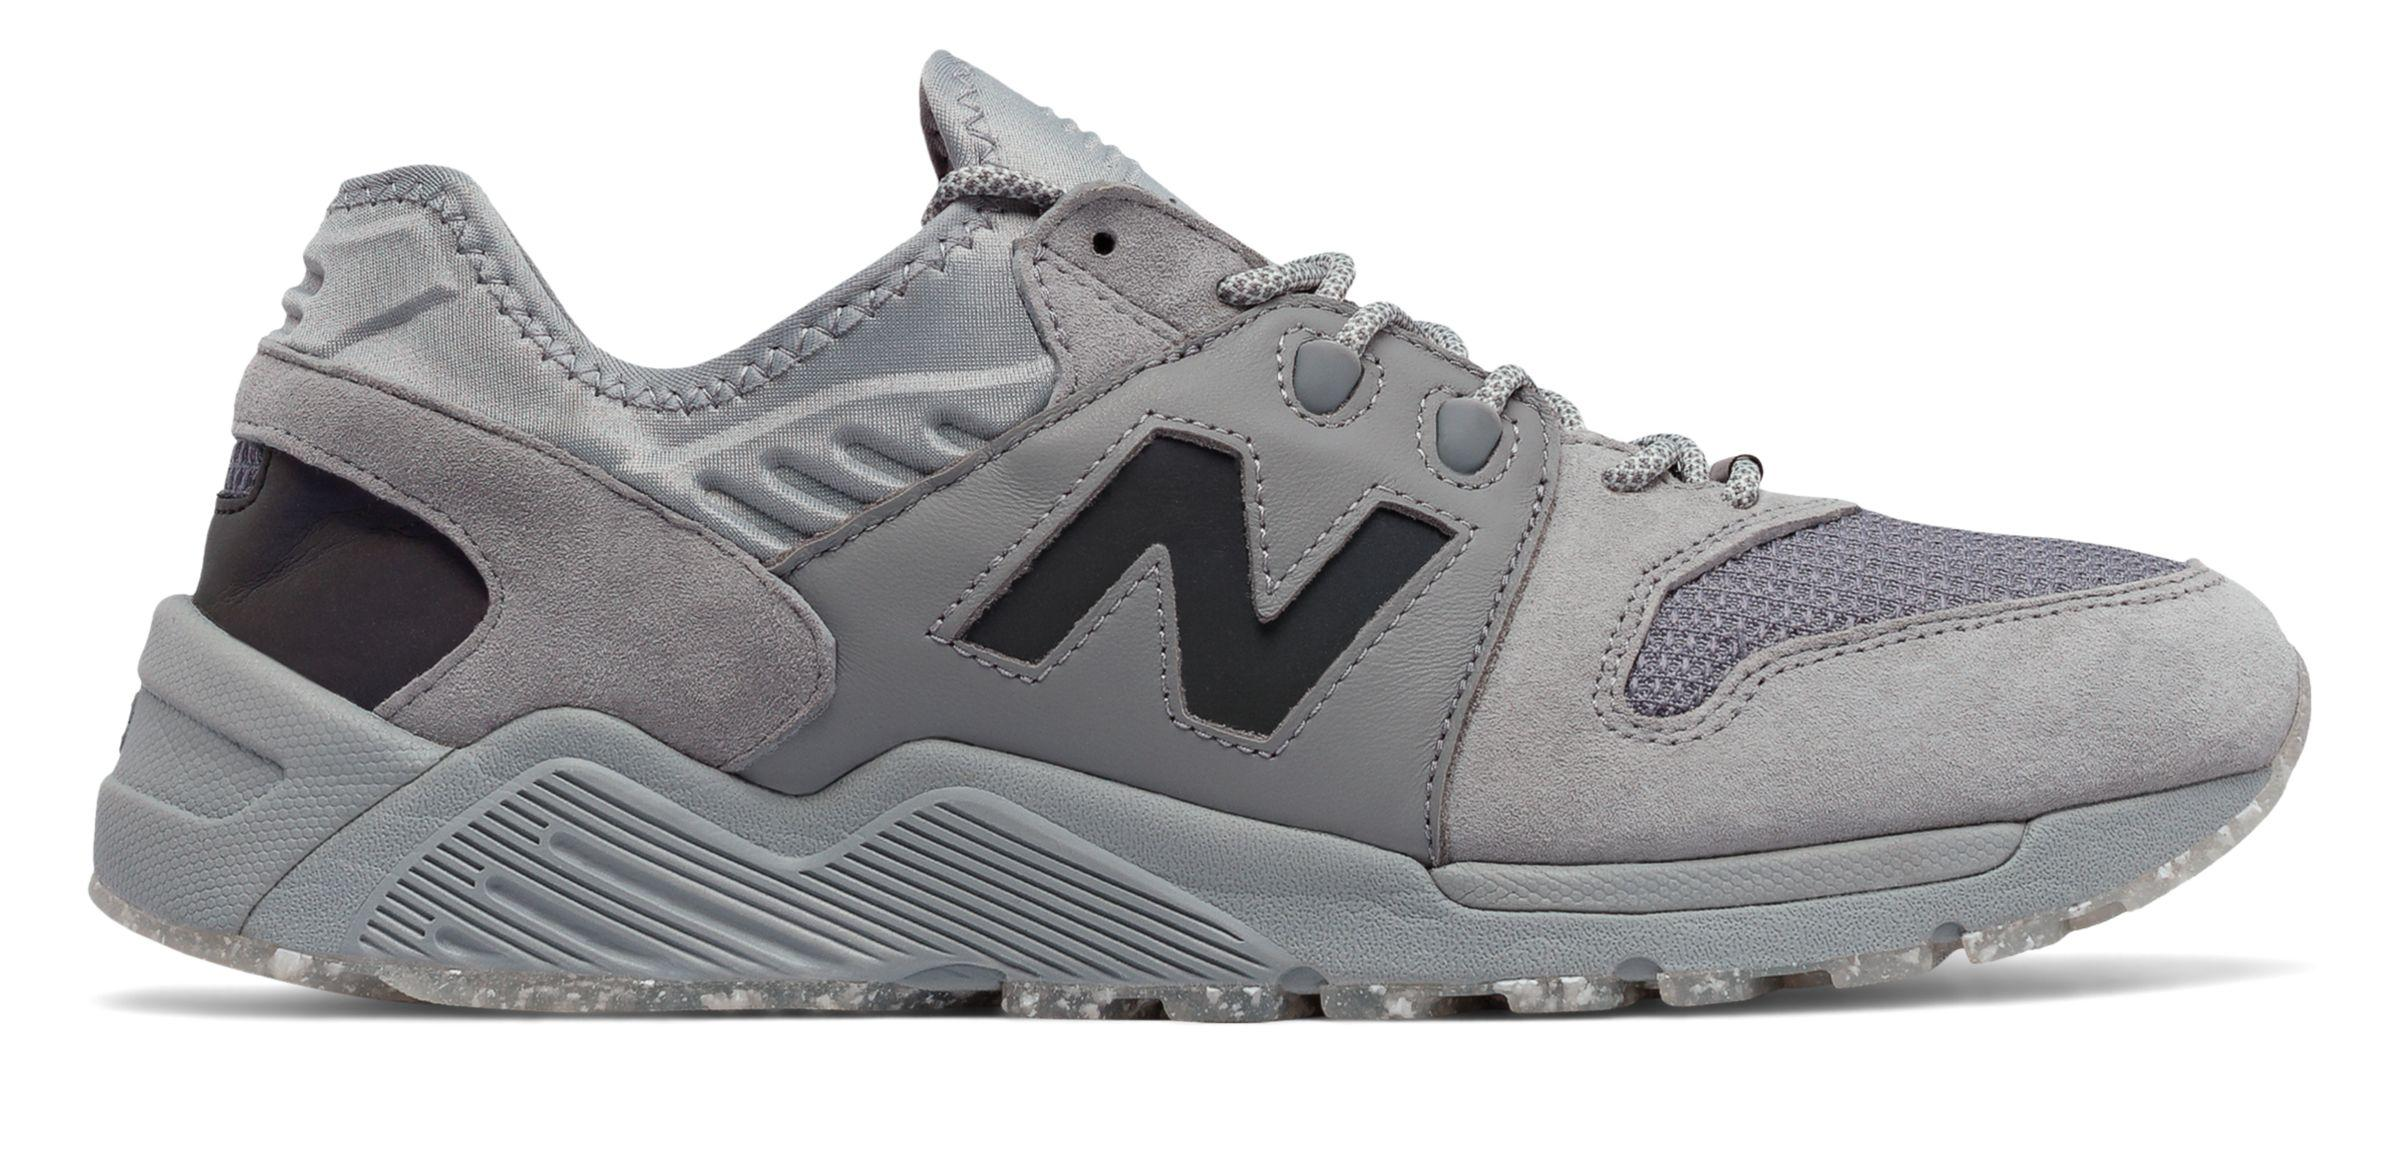 New Balance 009 low